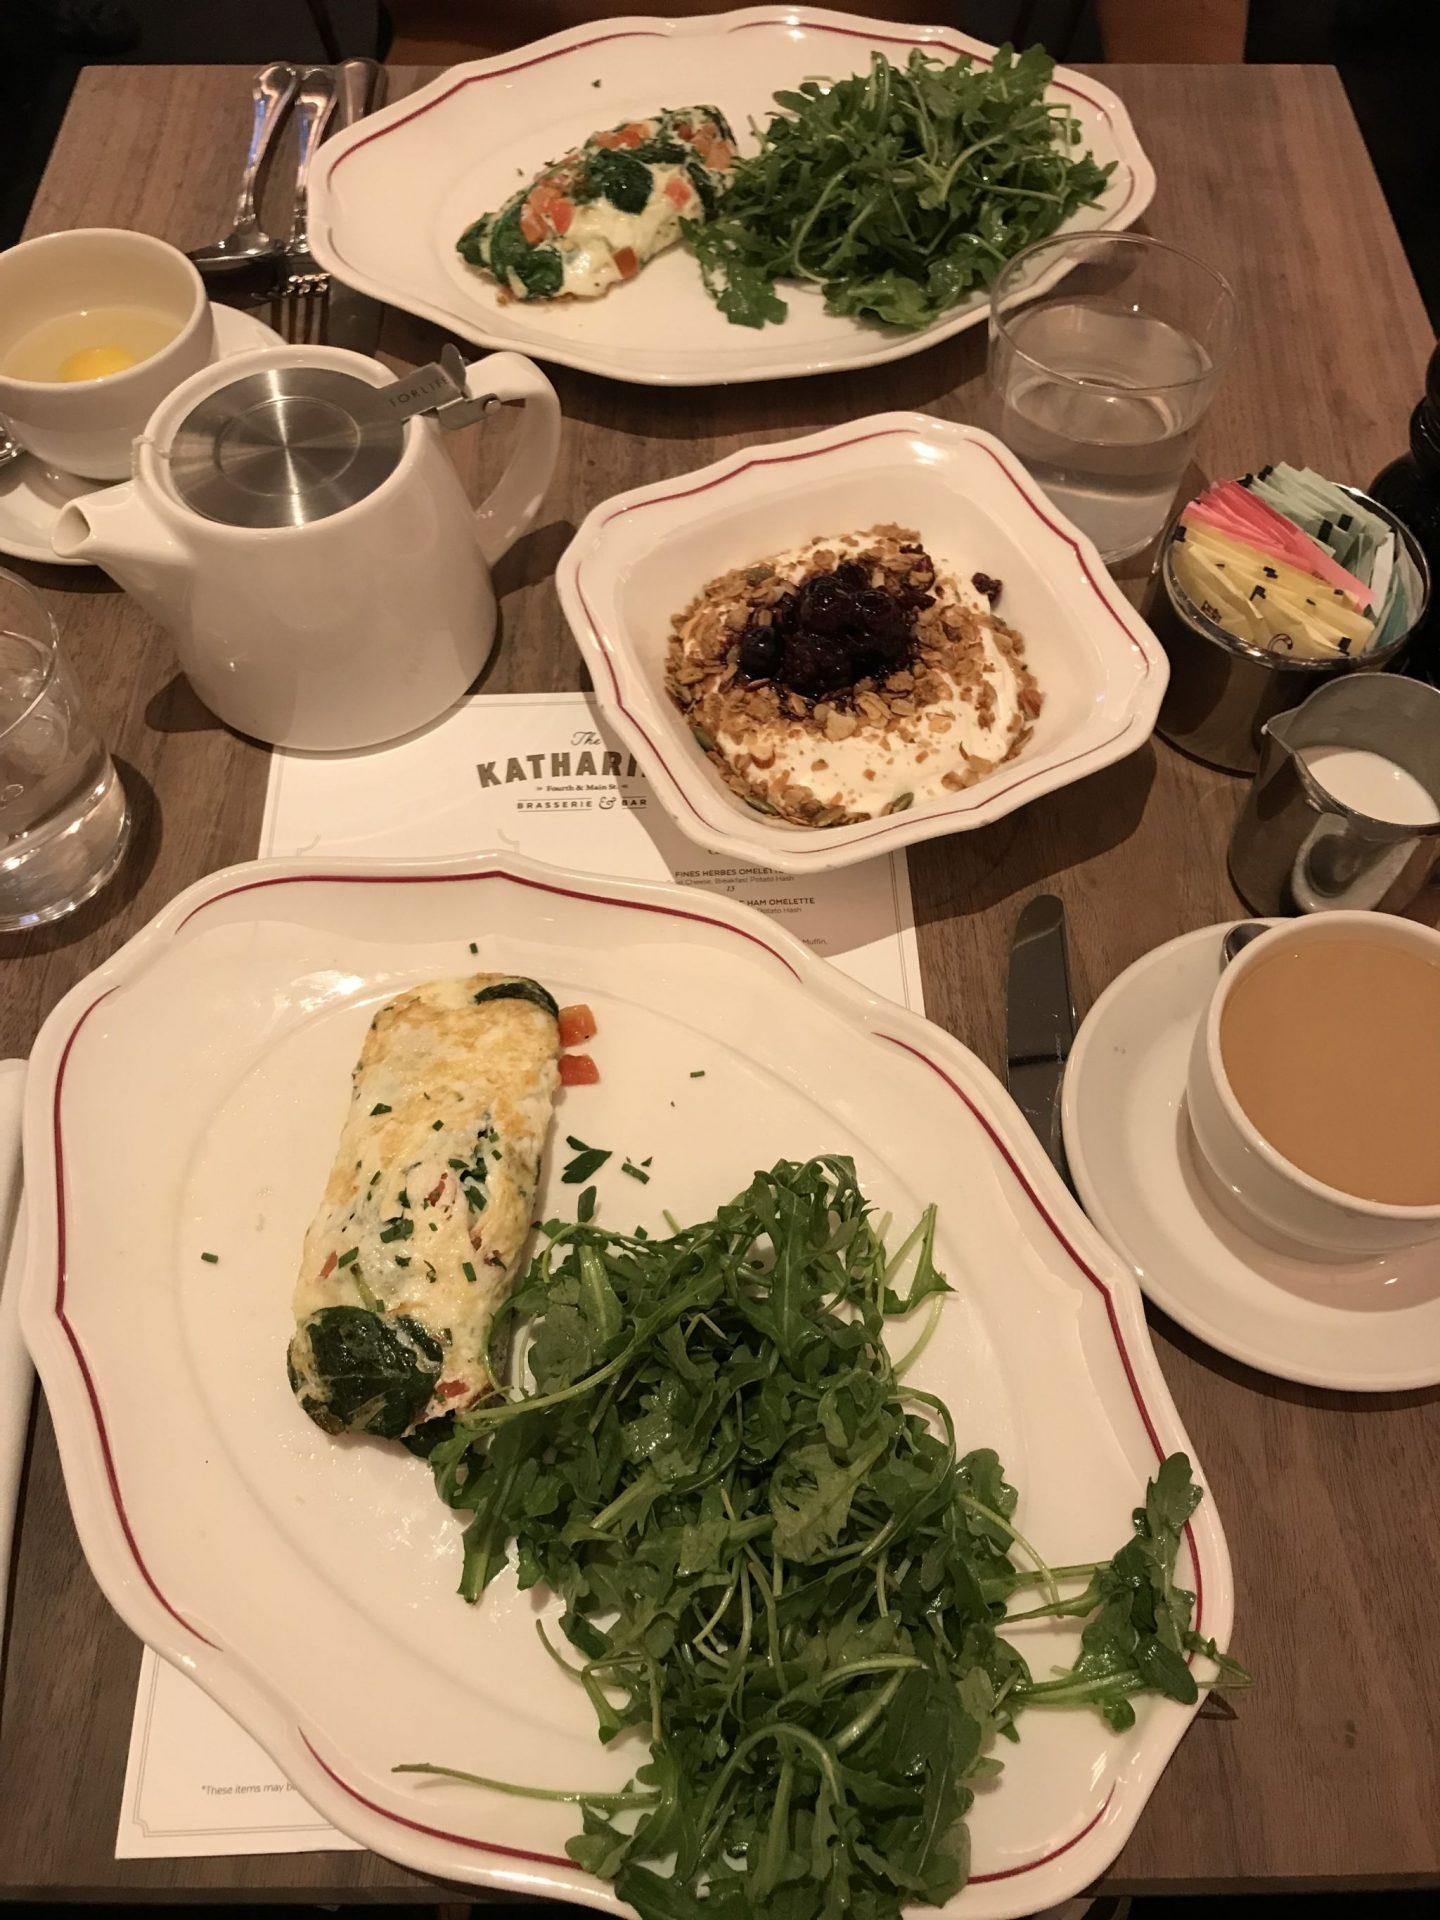 The Katherine Breakfast - Kimpton Cardinal Hotel - Winston Salem - Lauren Schwaiger Travel Blog